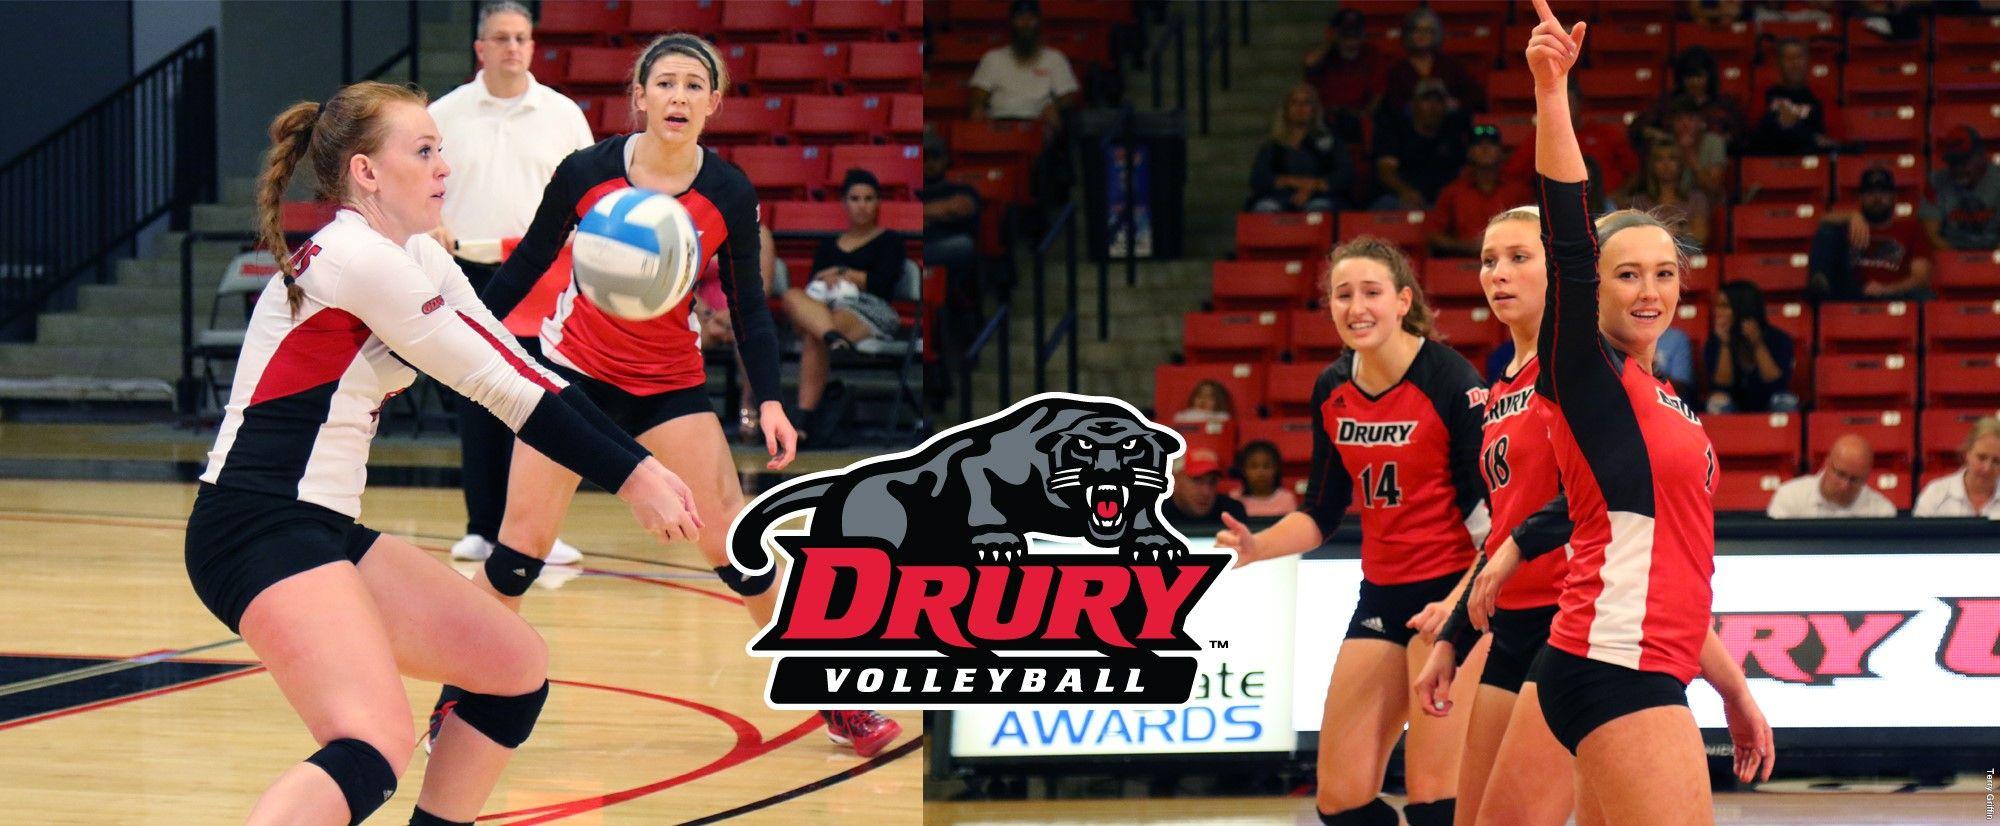 Bentley Mara Bree Schmidt Win Glvc Weekly Volleyball Awards Athlete Volleyball Drury University